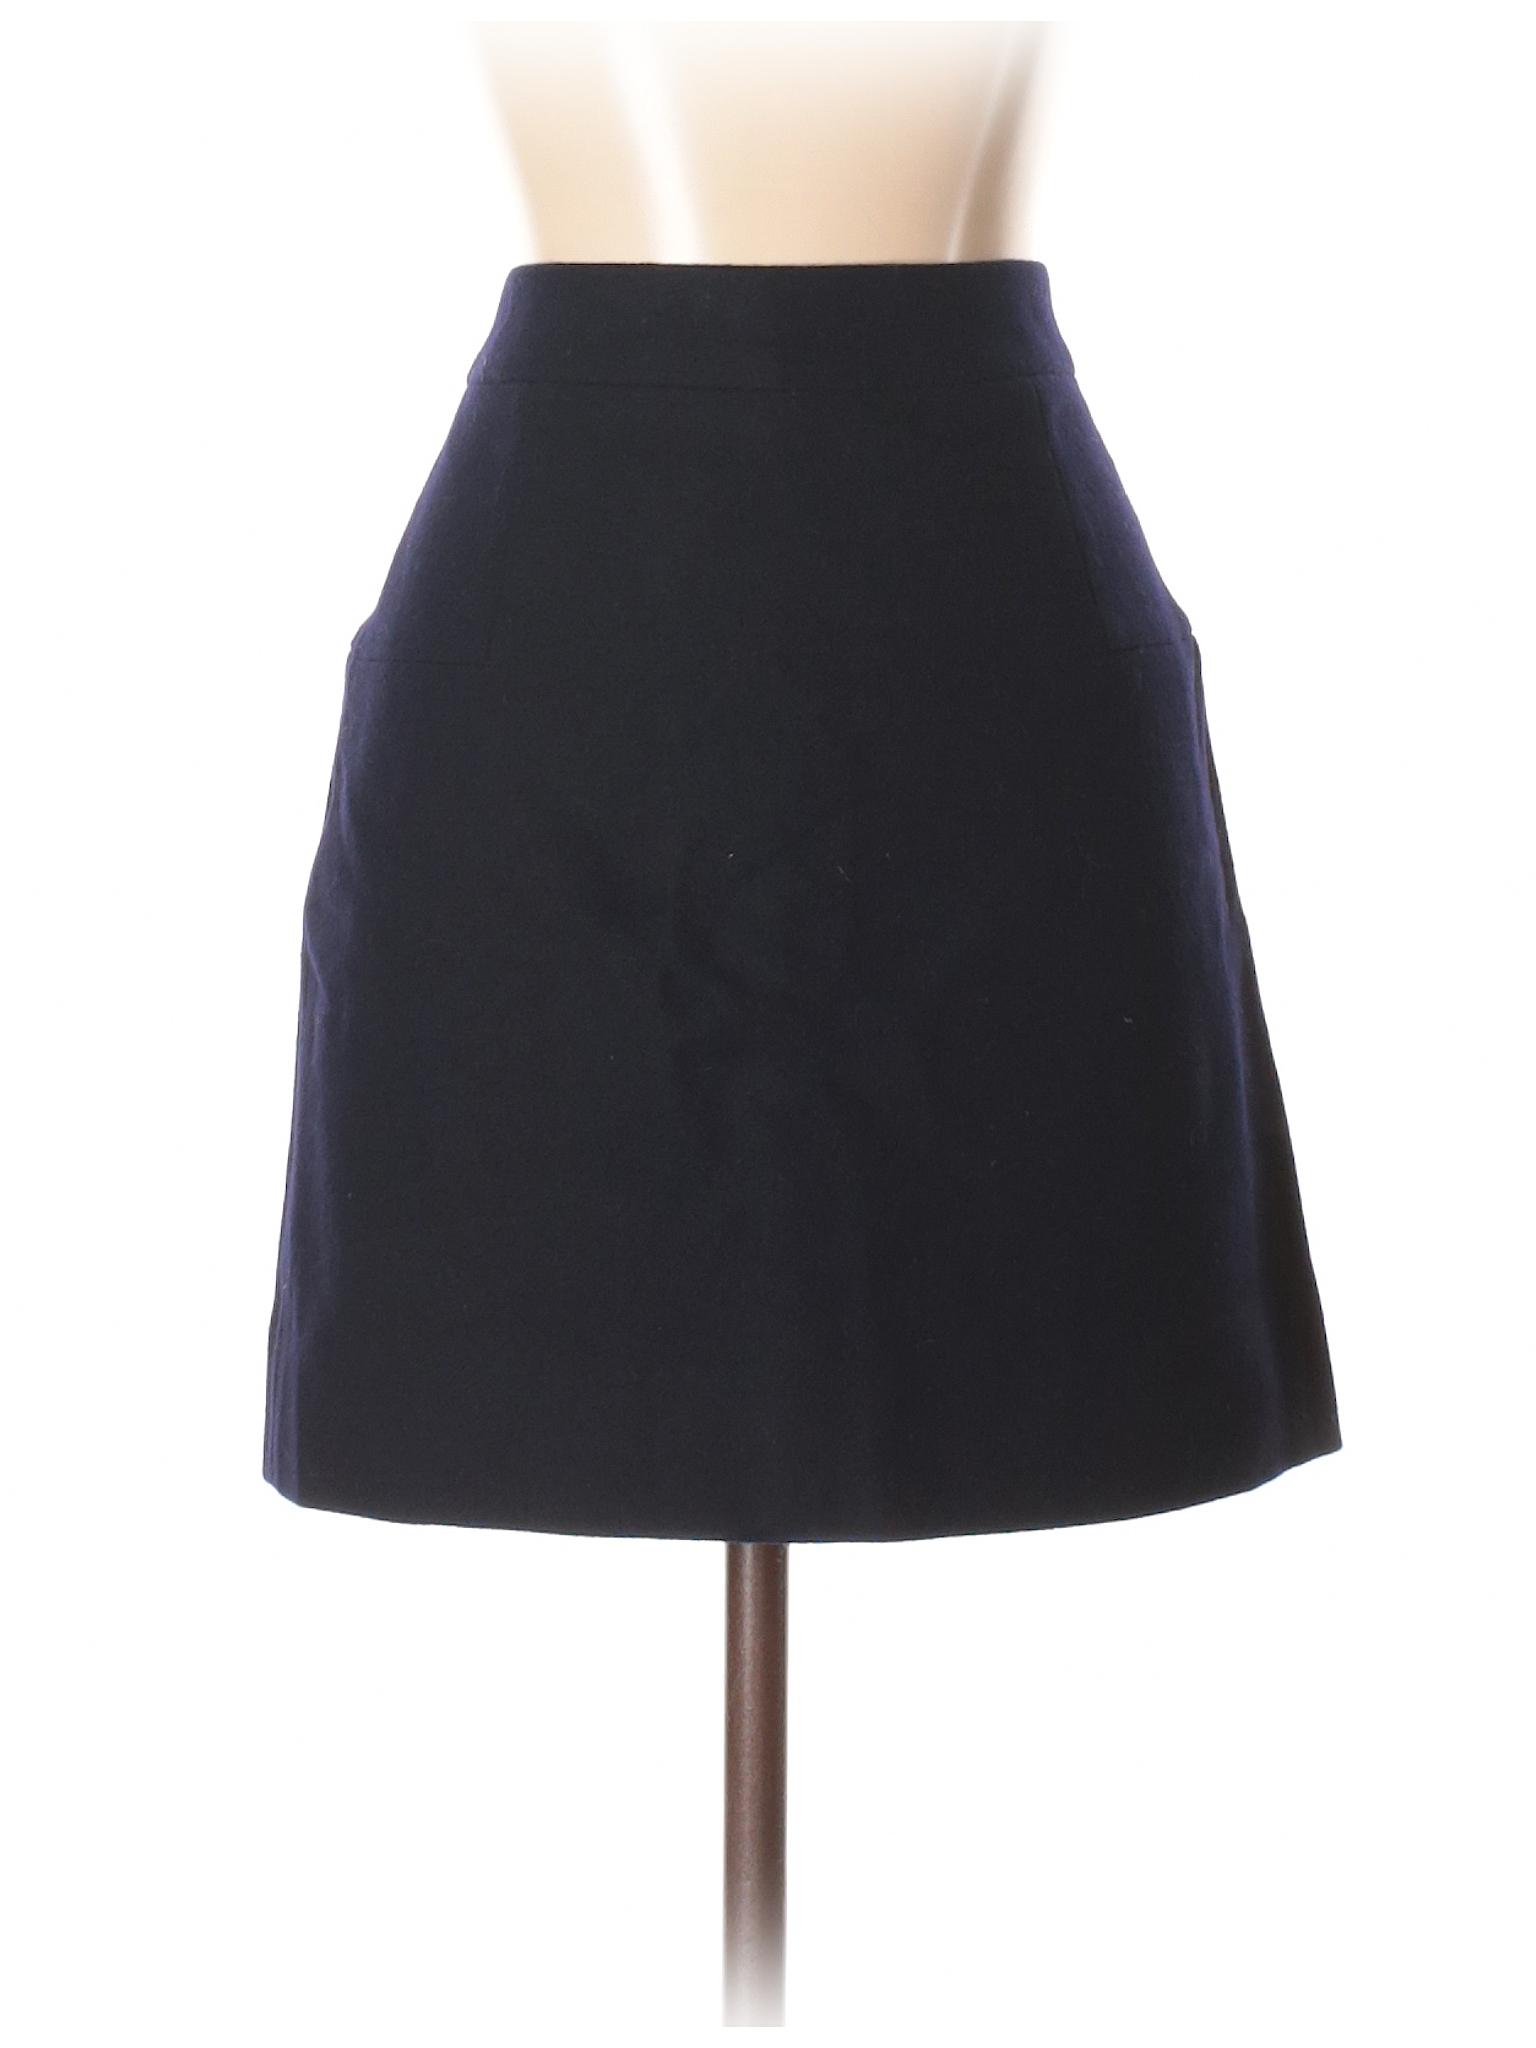 Store Skirt winter Wool Crew Factory J Leisure wpPqIzHq